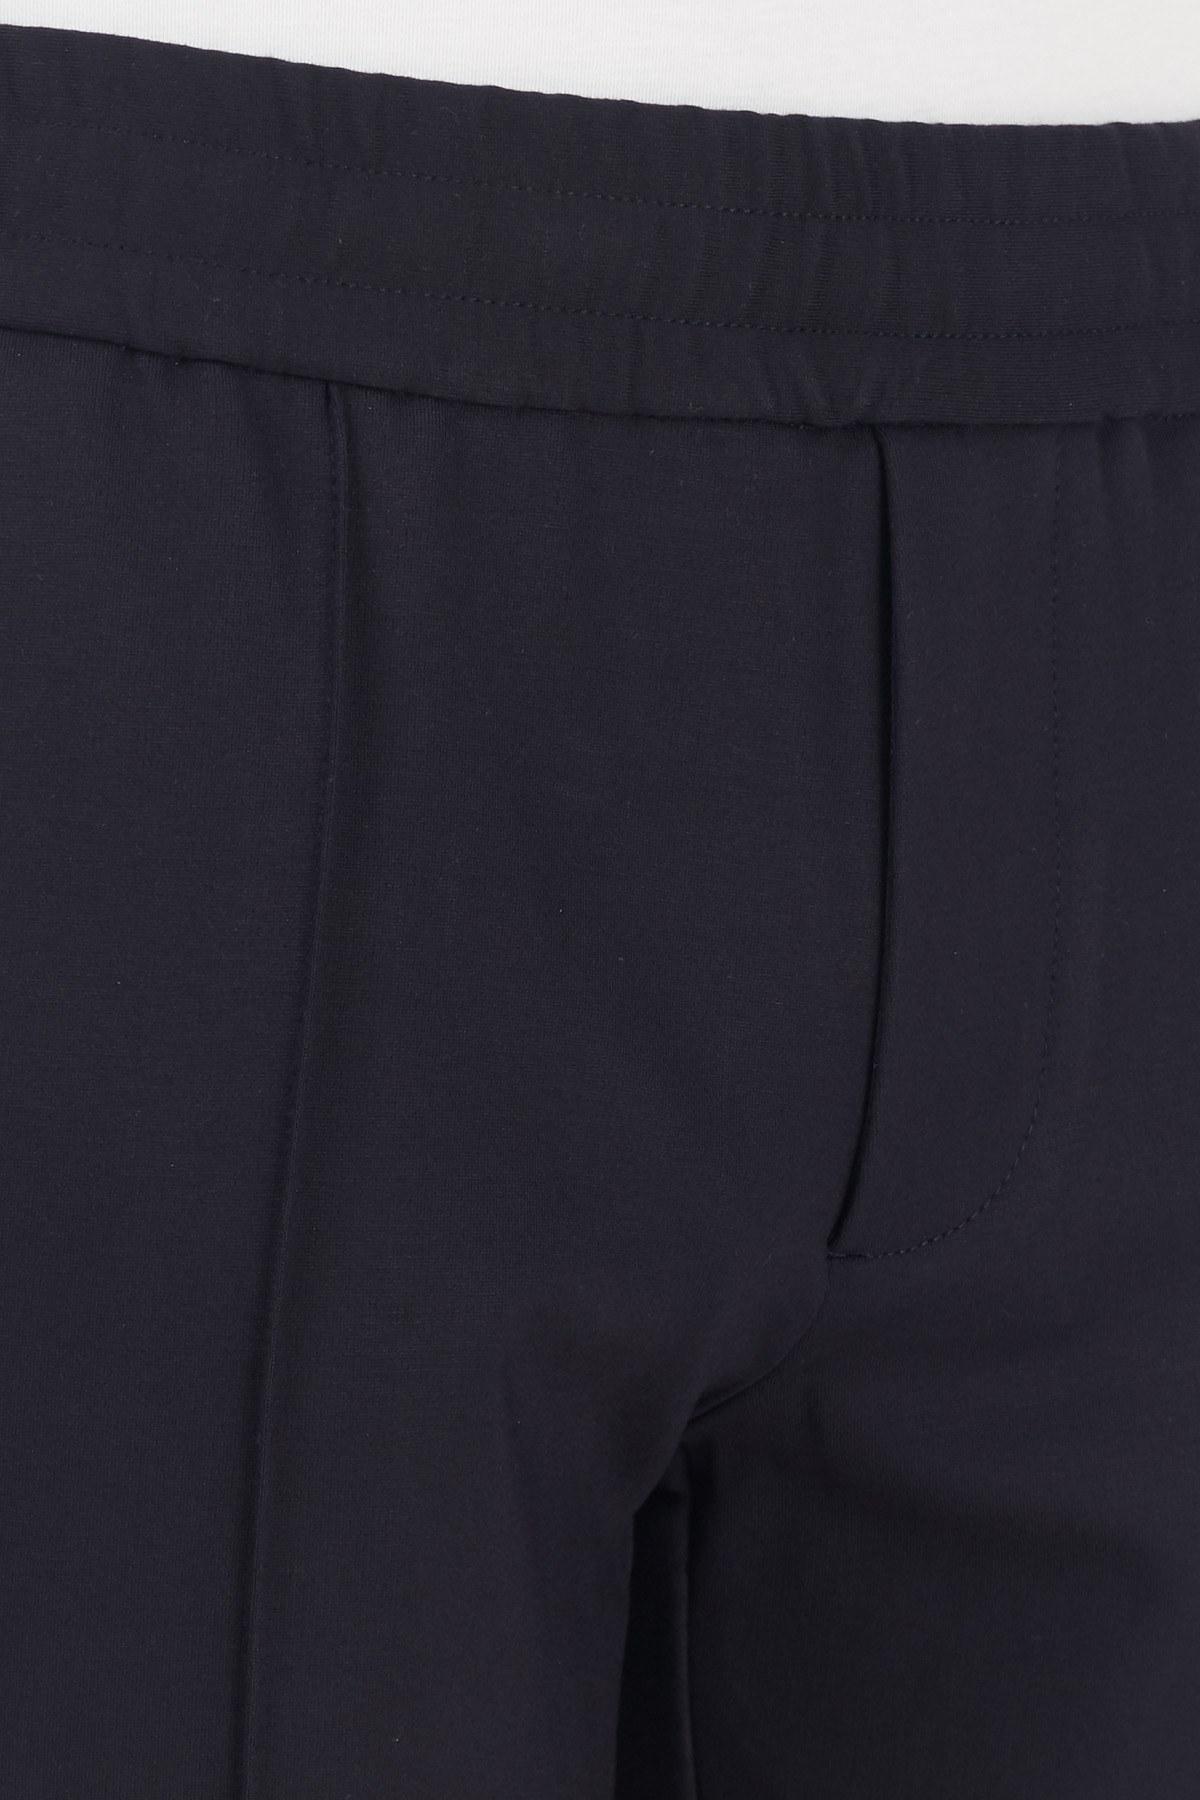 Emporio Armani Cepli Erkek Pantolon 6H1PL6 1JDRZ 0920 LACİVERT